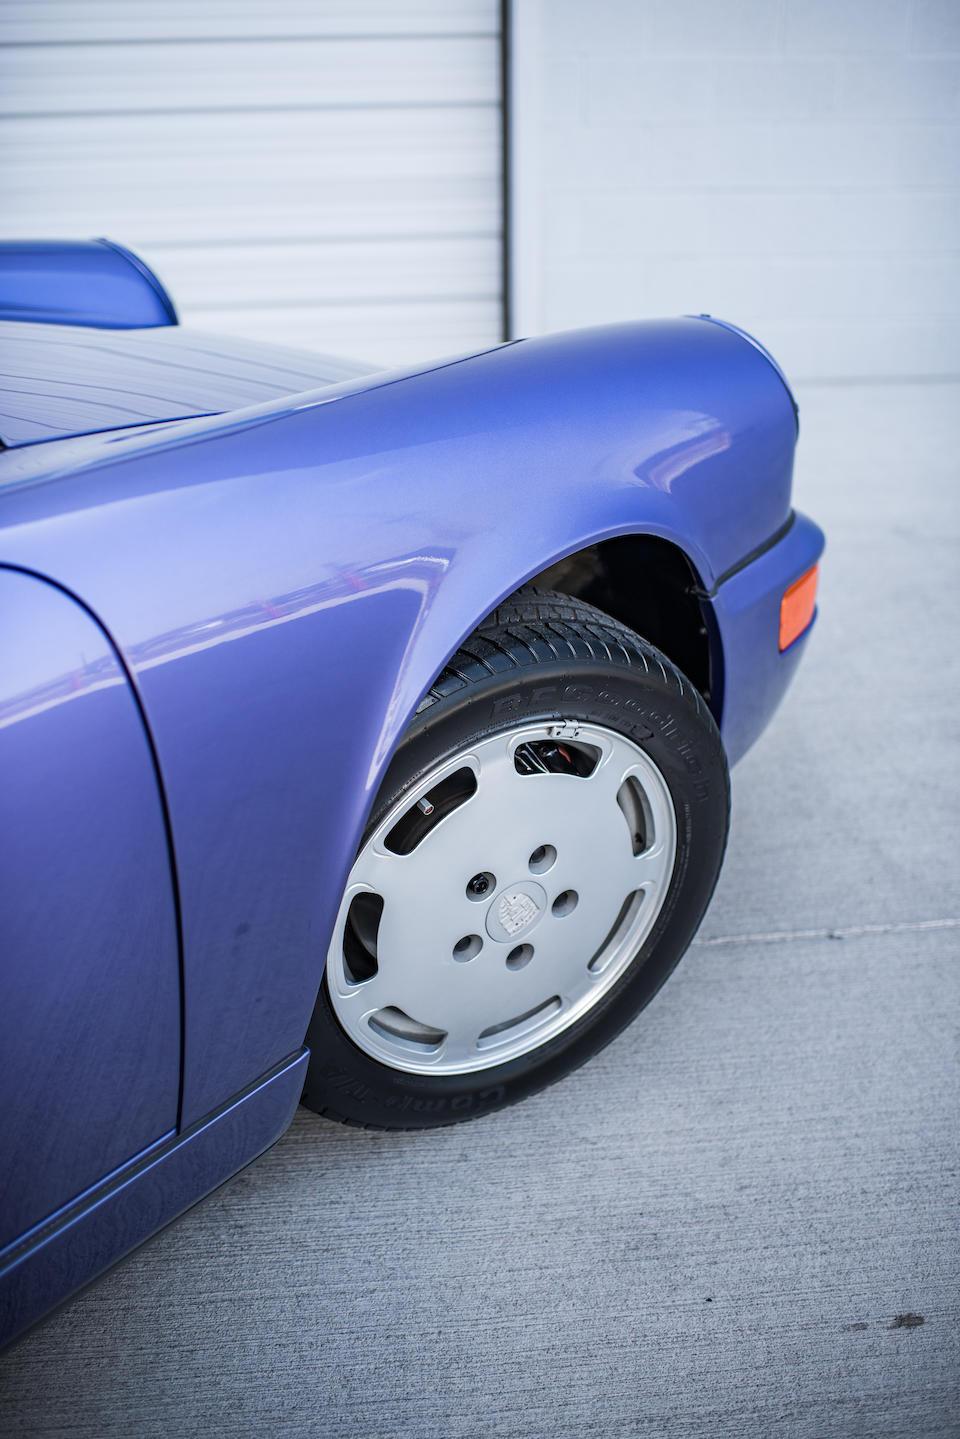 <b>1991 Porsche 911 Carrera 4 Coupe</b><br />VIN. WP0AB2965MS411518<br />Engine no. 62M11263